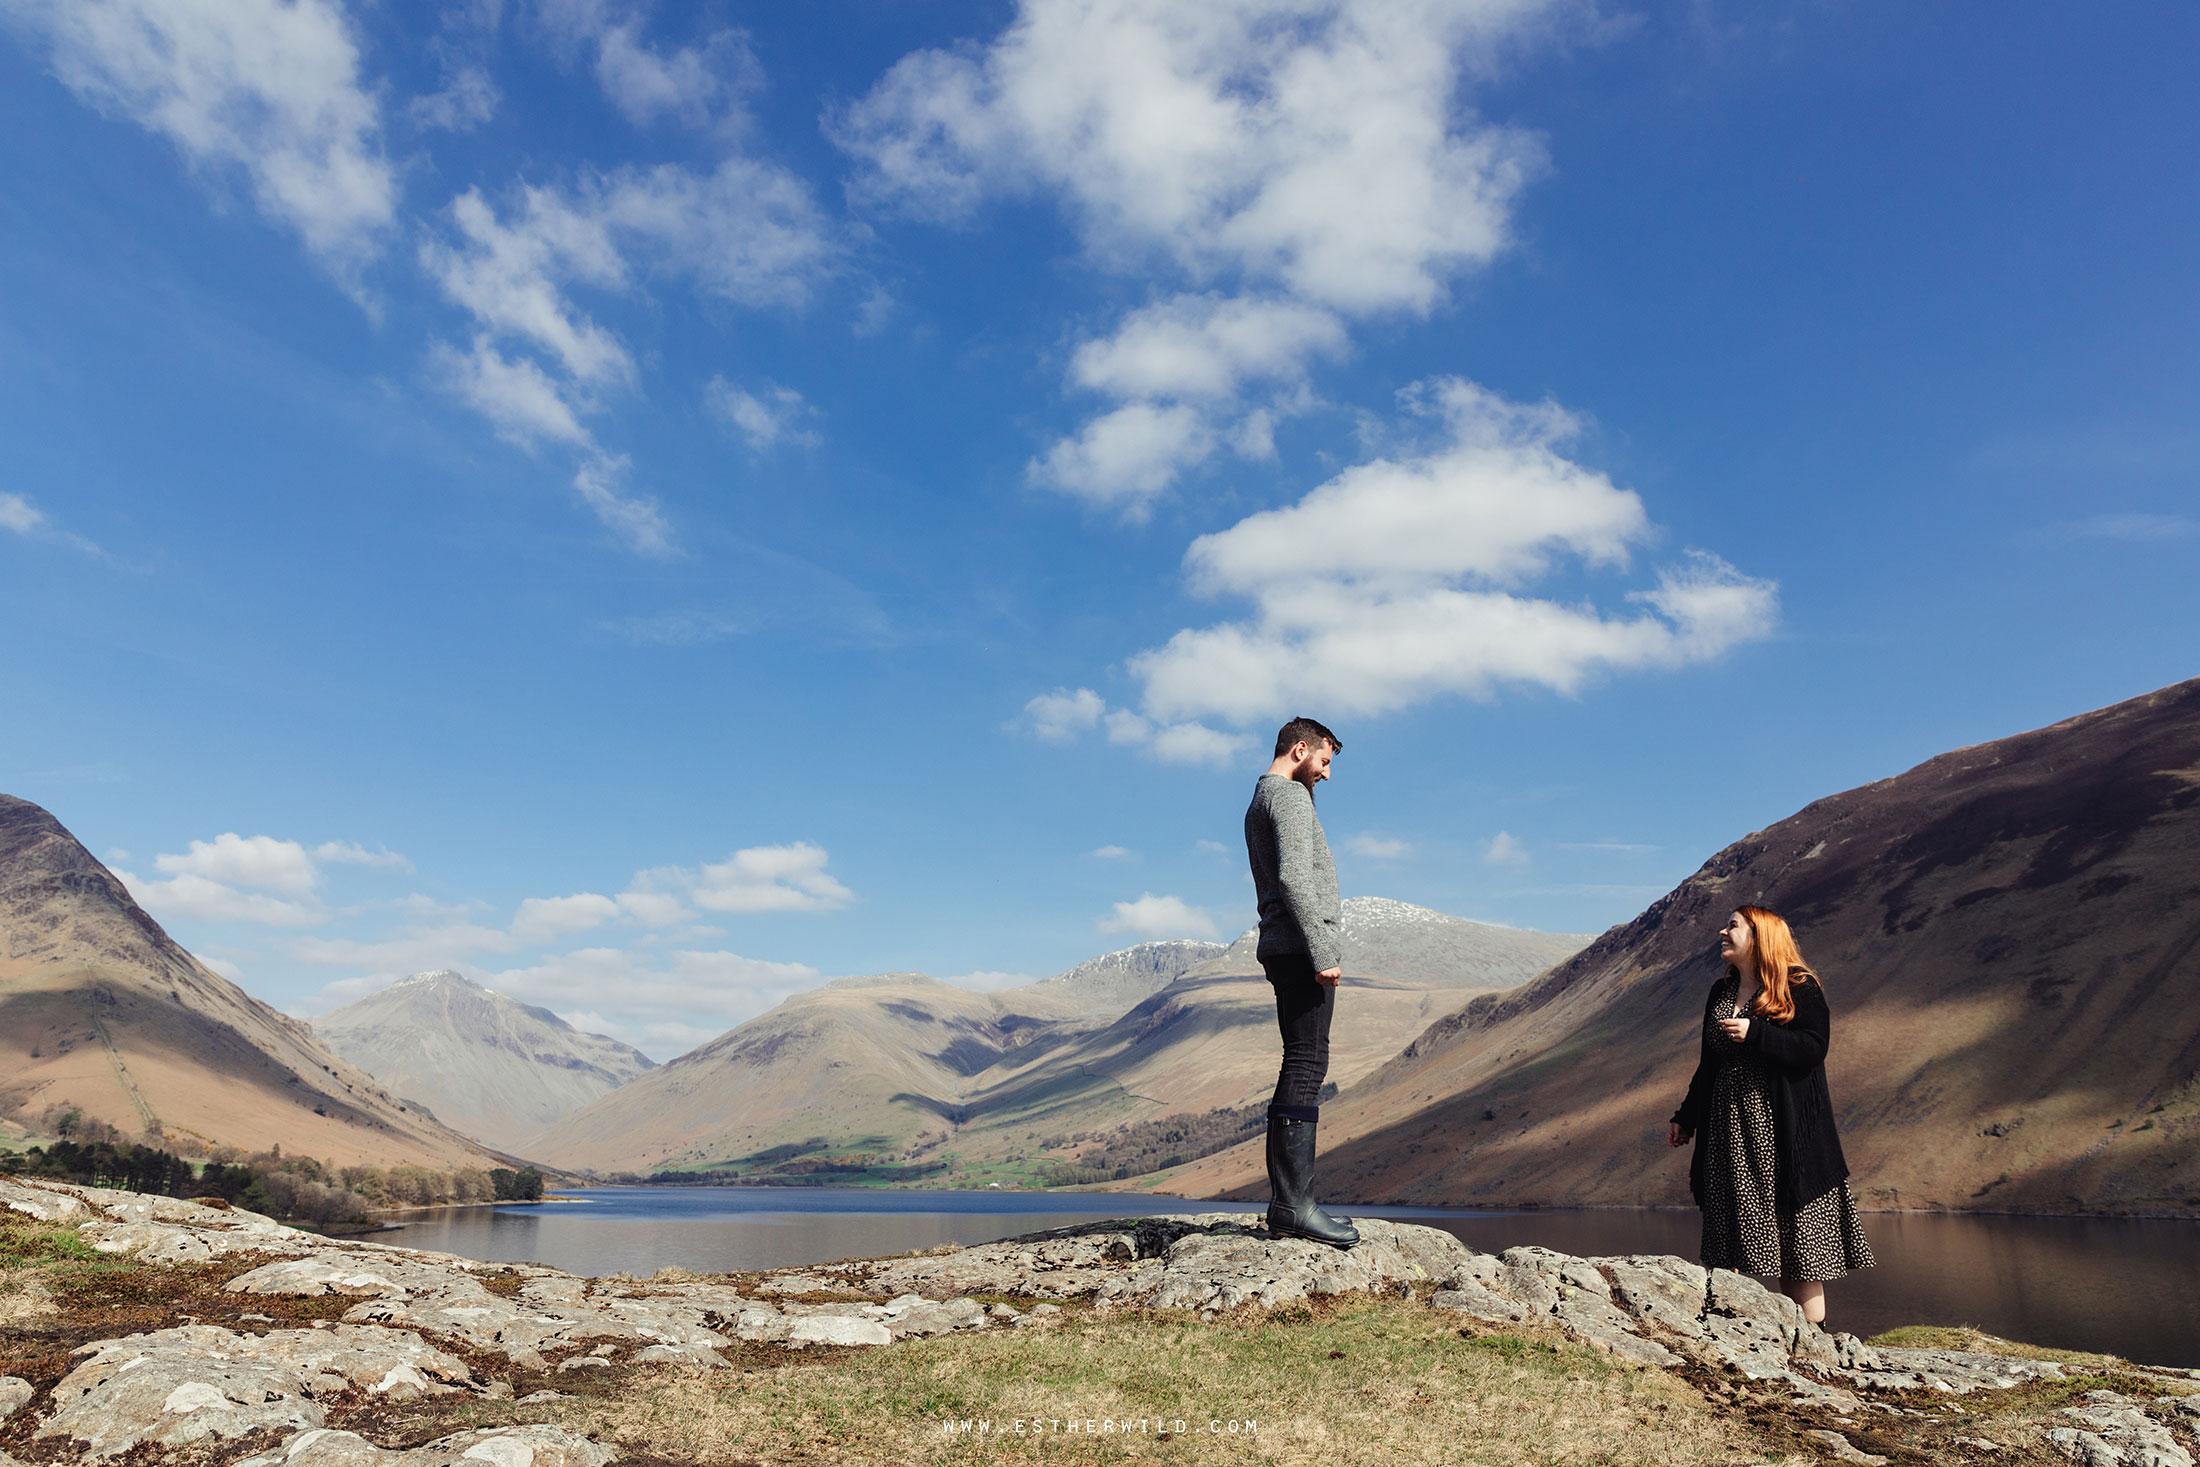 Cumbria_Lake_District_Wasdale_Wedding_Photographer_Destination_Engagement_Anniversary_Esther_Wild_IMG_3183.jpg